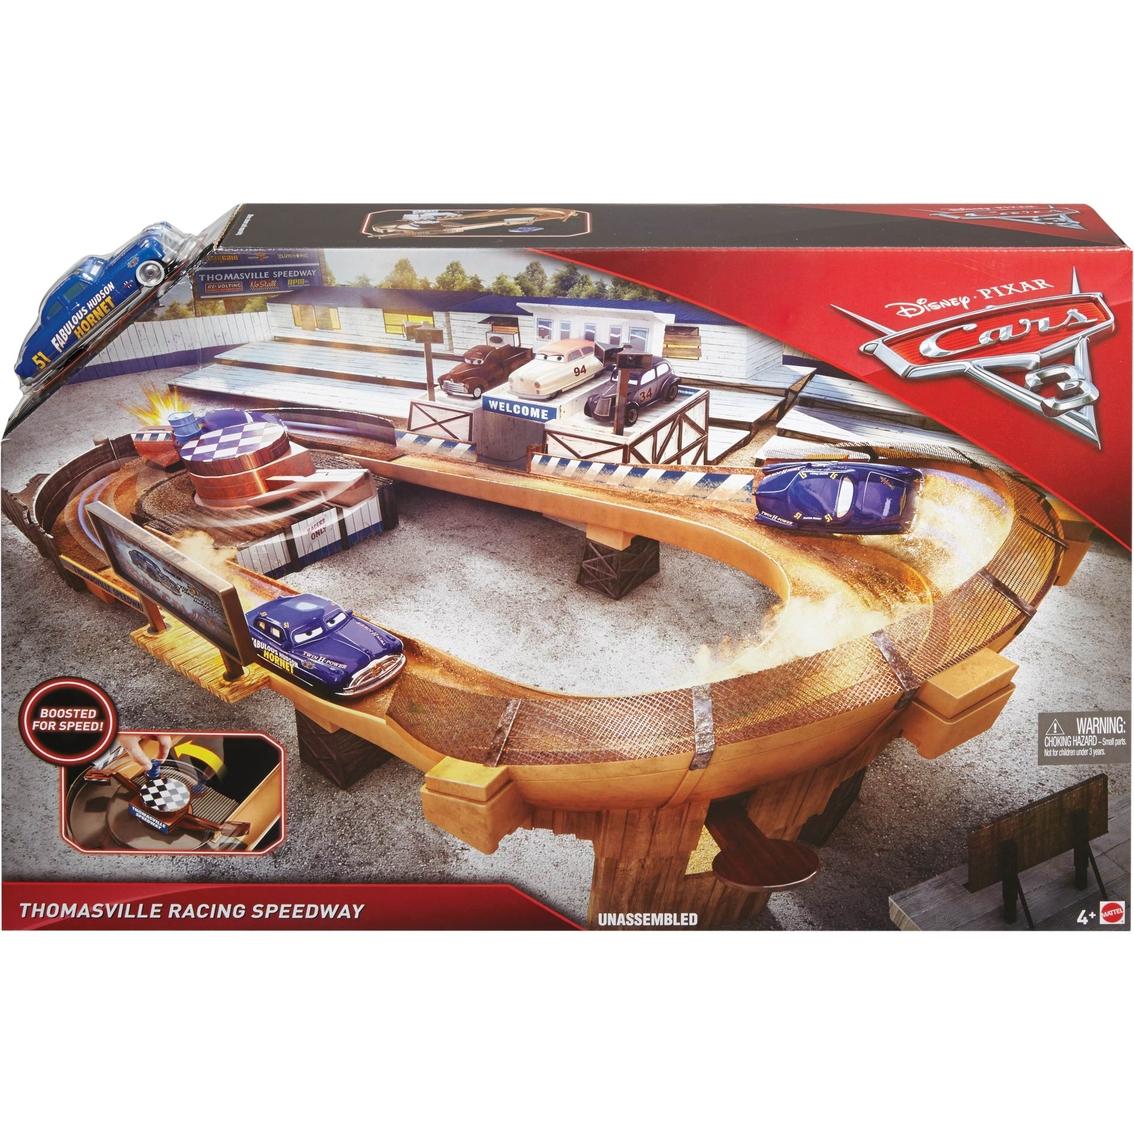 Disney Pixar Cars Thomasville Racing Sdway Track Set